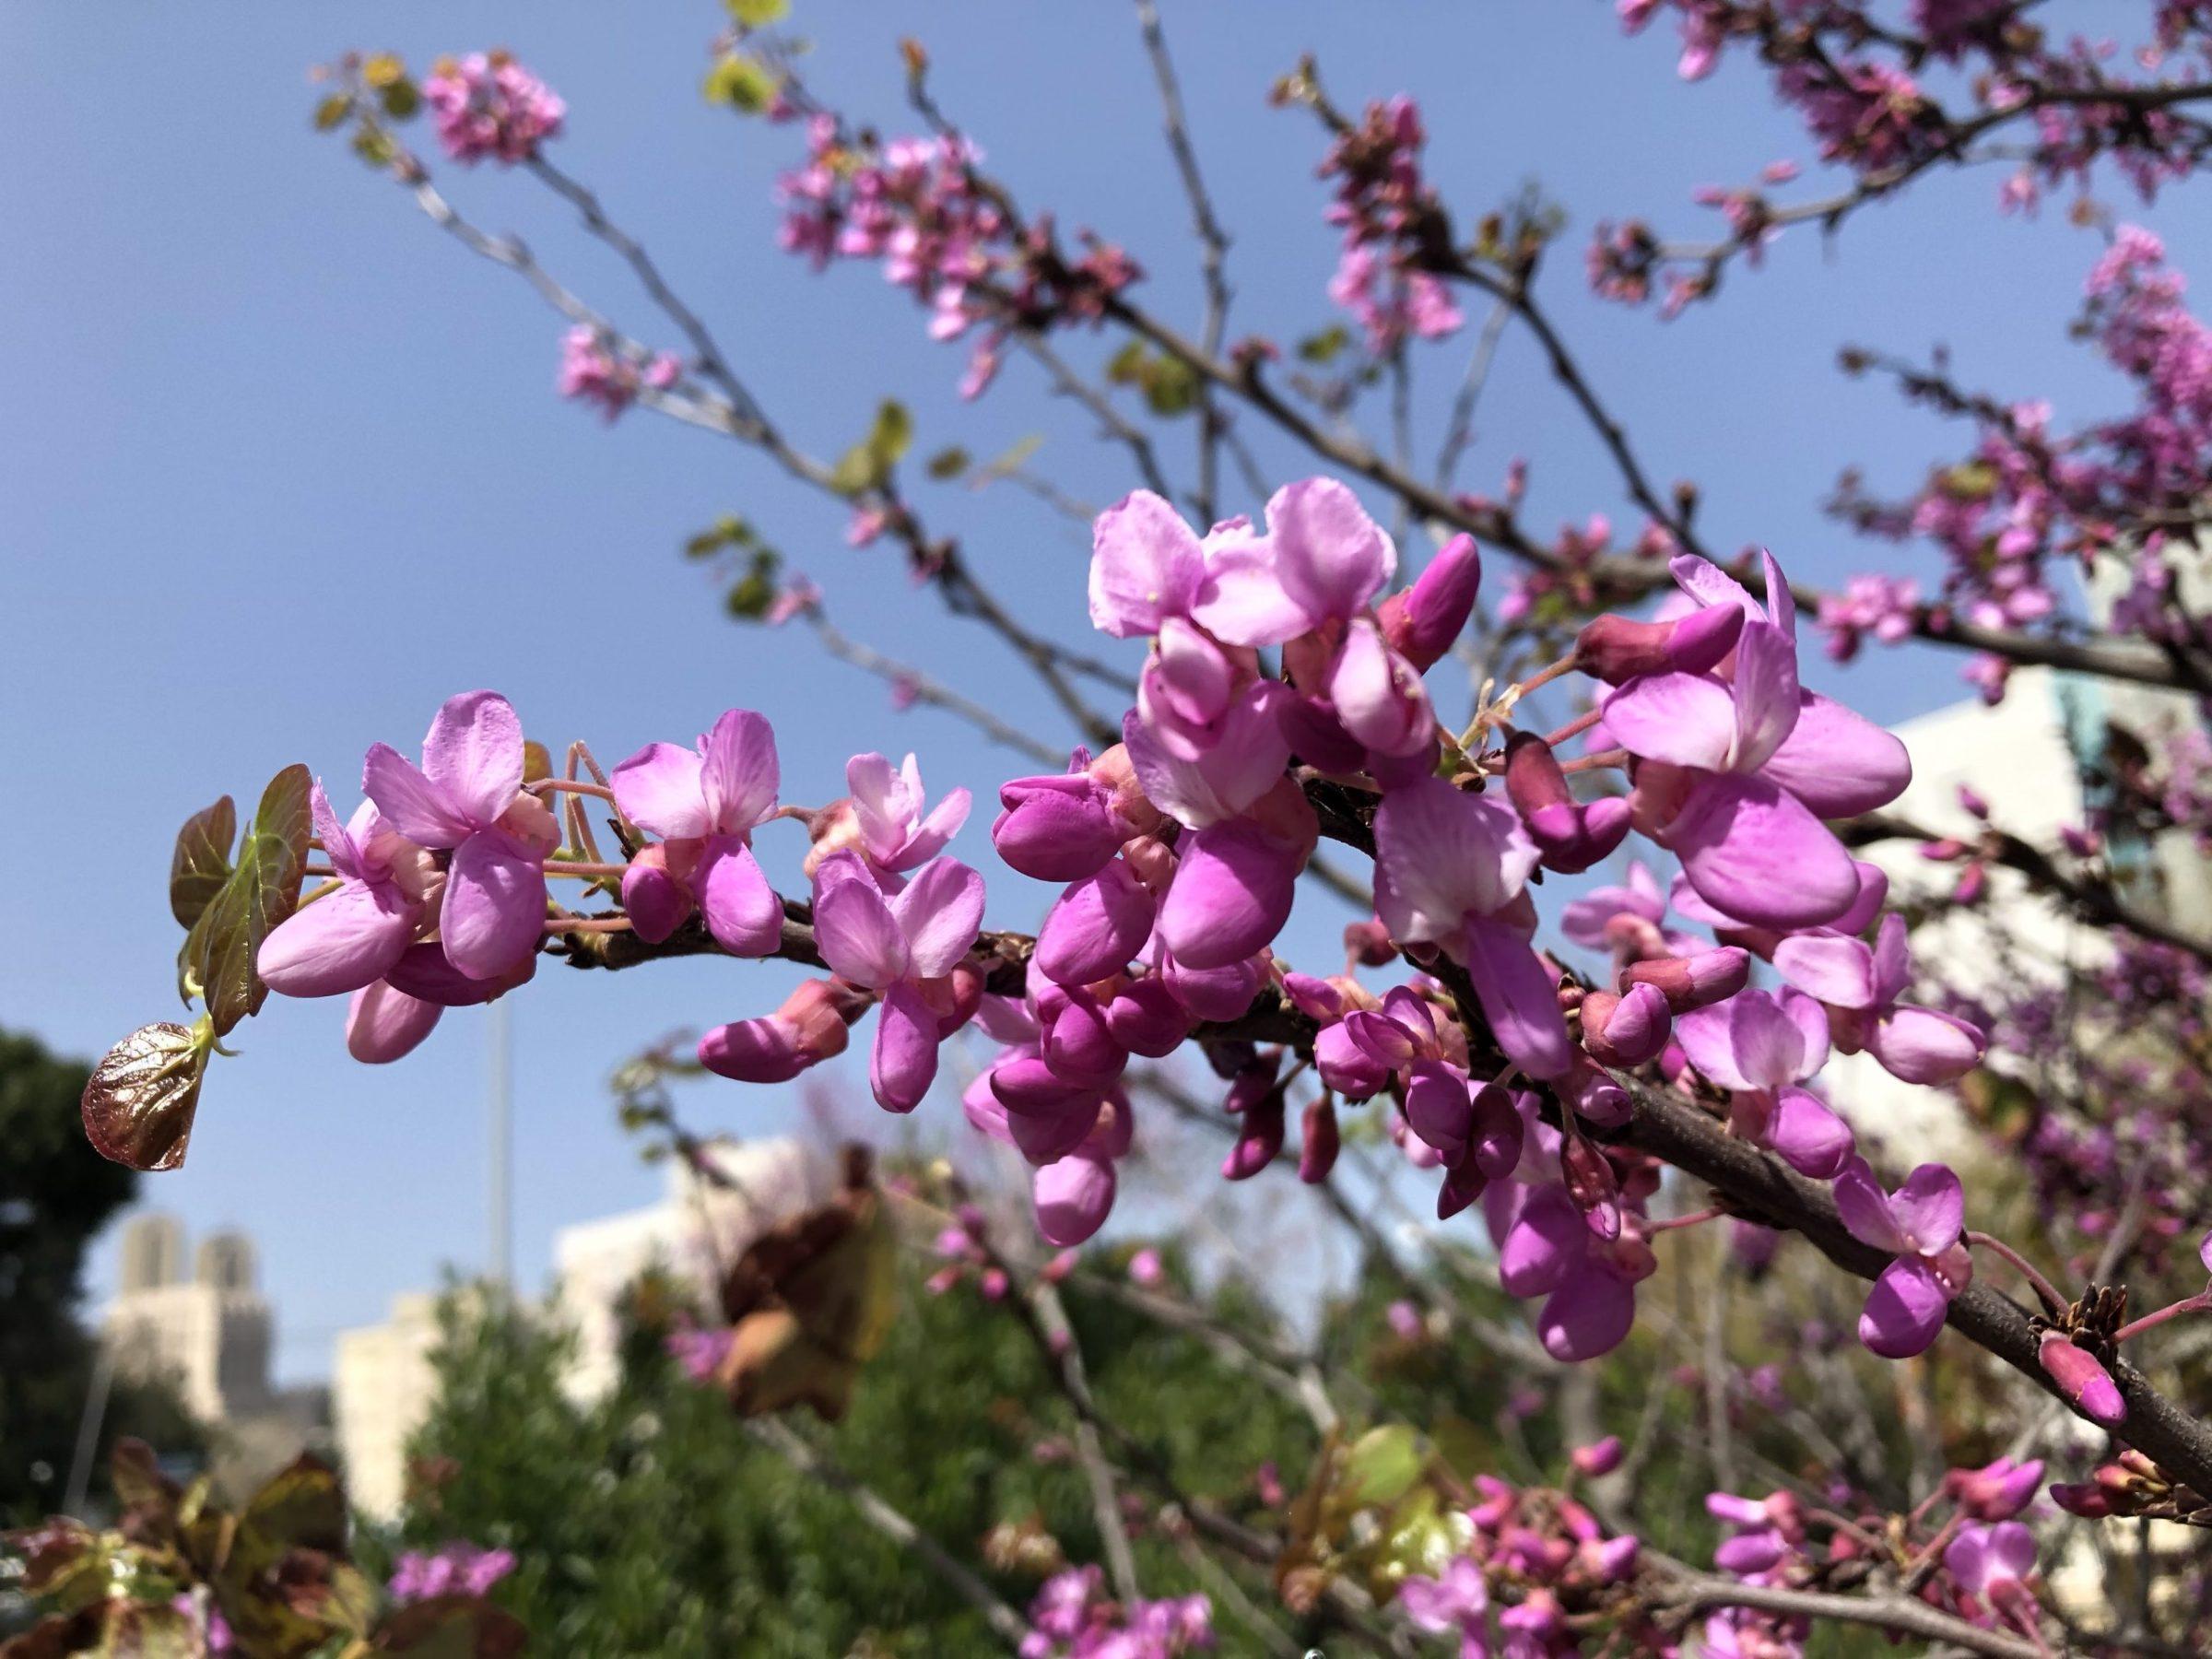 Israel blossoms